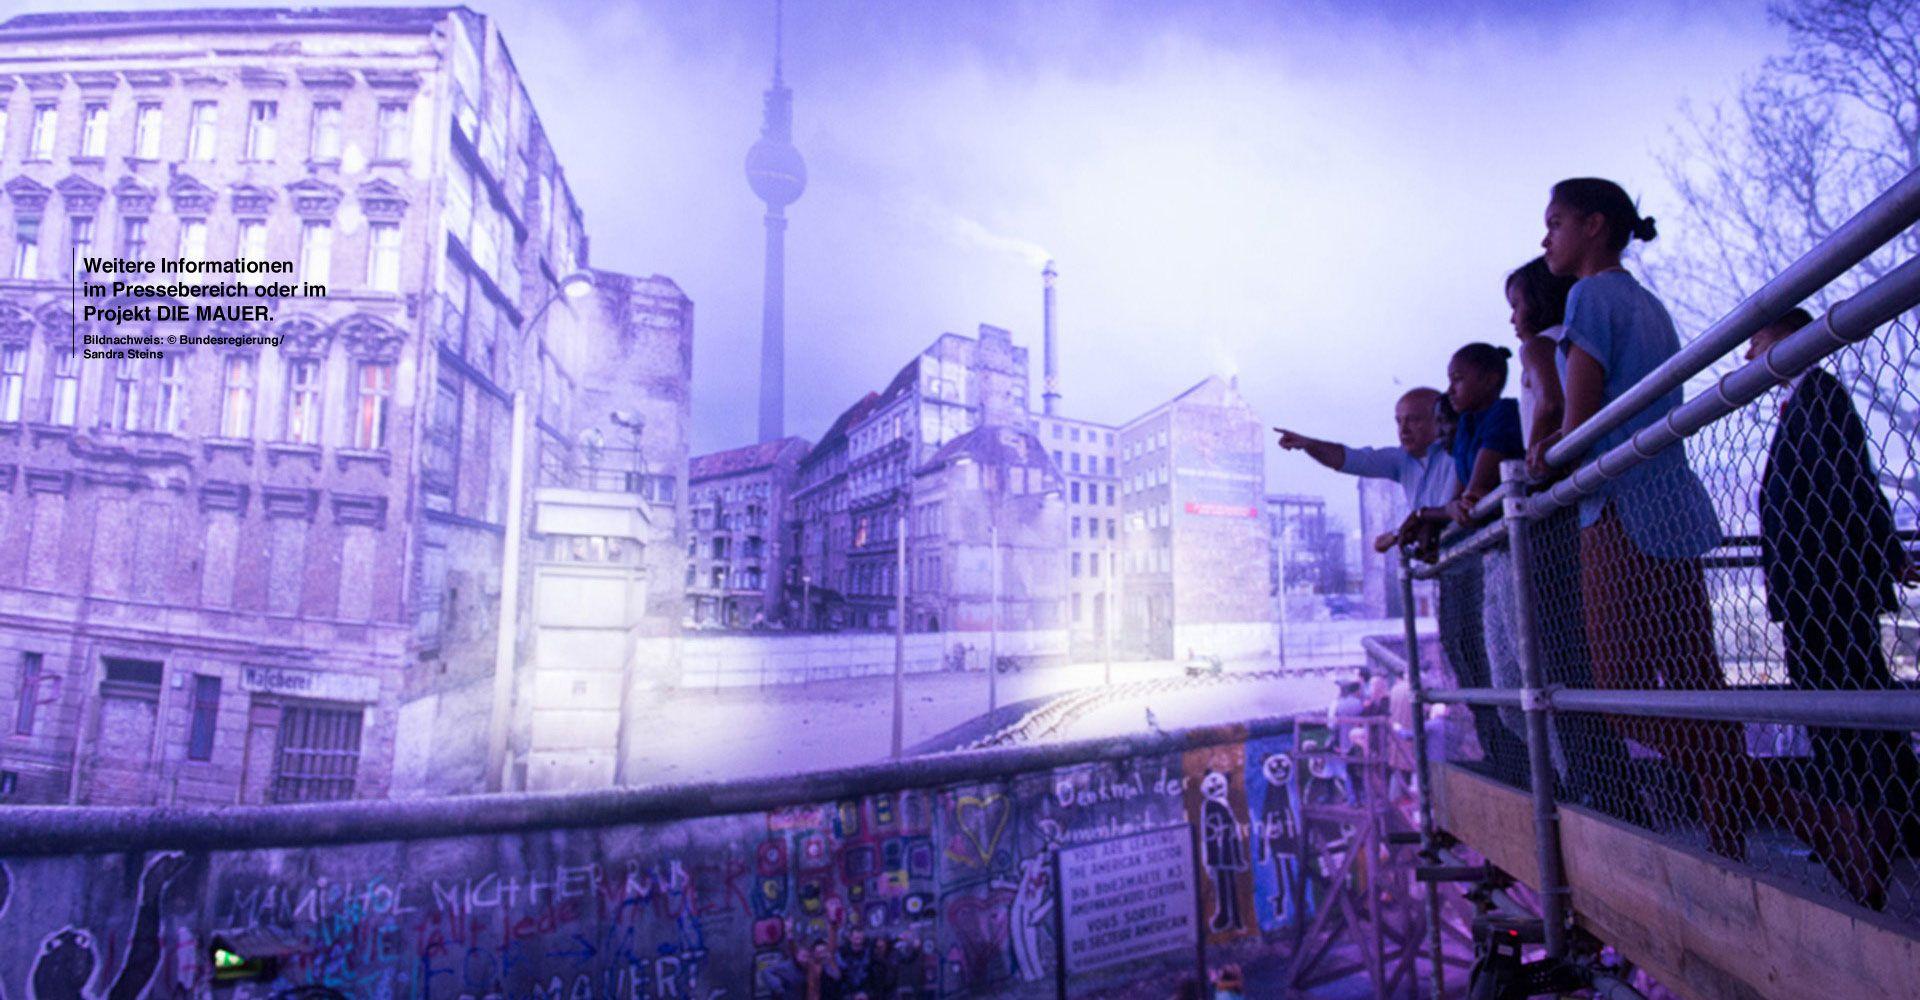 Ausstellung Berlin MAUERPanorama im asisi Panometer